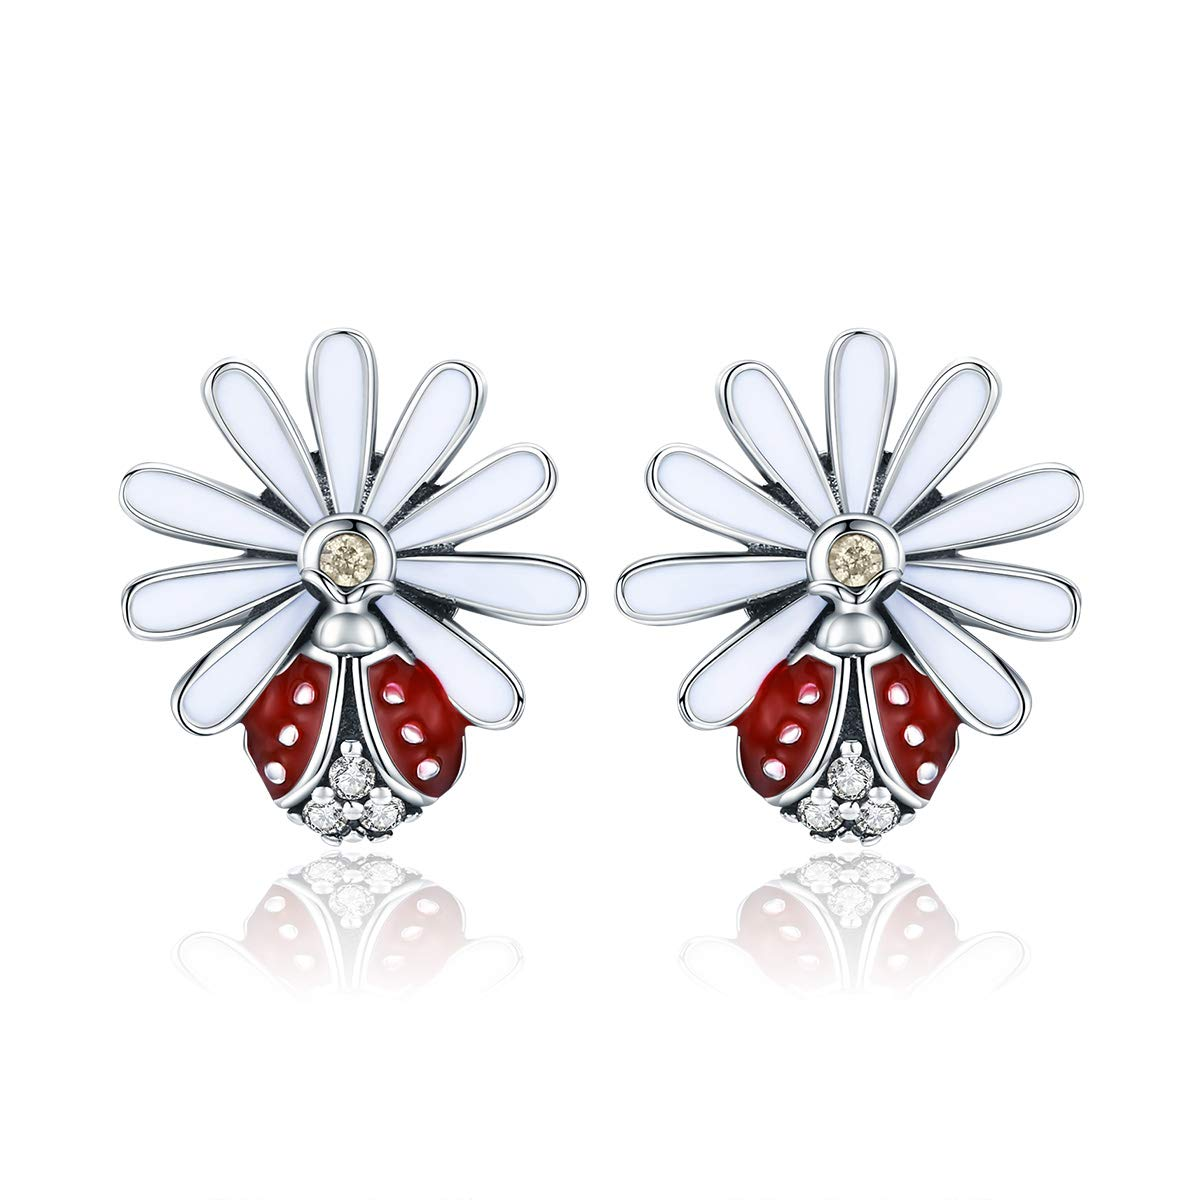 BAMOER 925 Sterling Silver Ladybug Accessories for Women Ladybug Bracelet Charm Ladybug Gifts